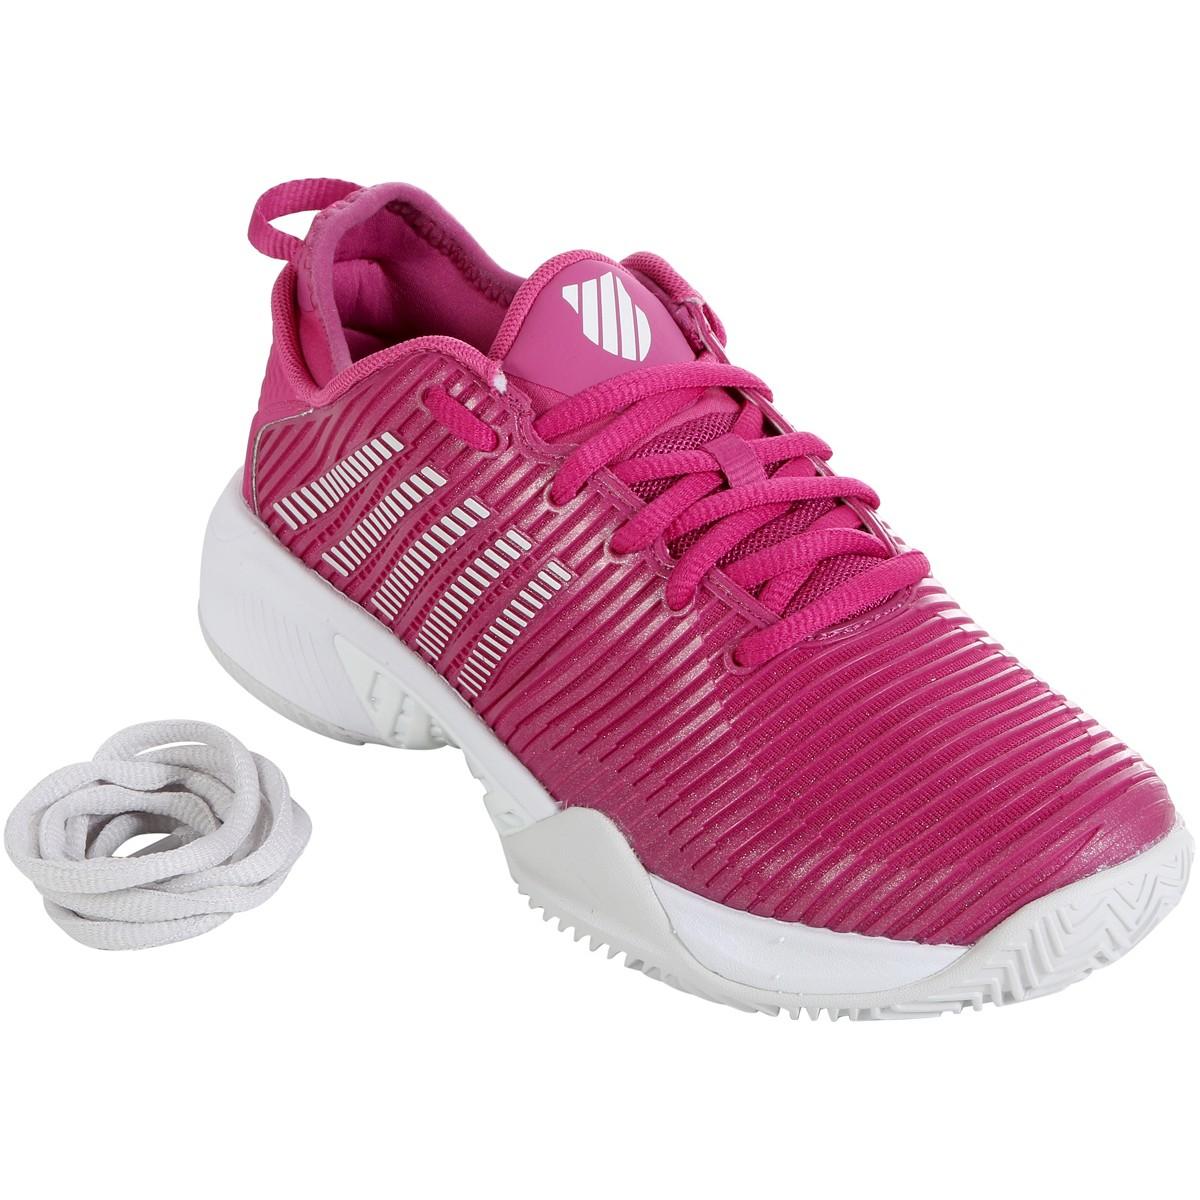 Hypercourt-Supreme-Shoe.. +80 Most Inspiring Workout Shoes Ideas for Women